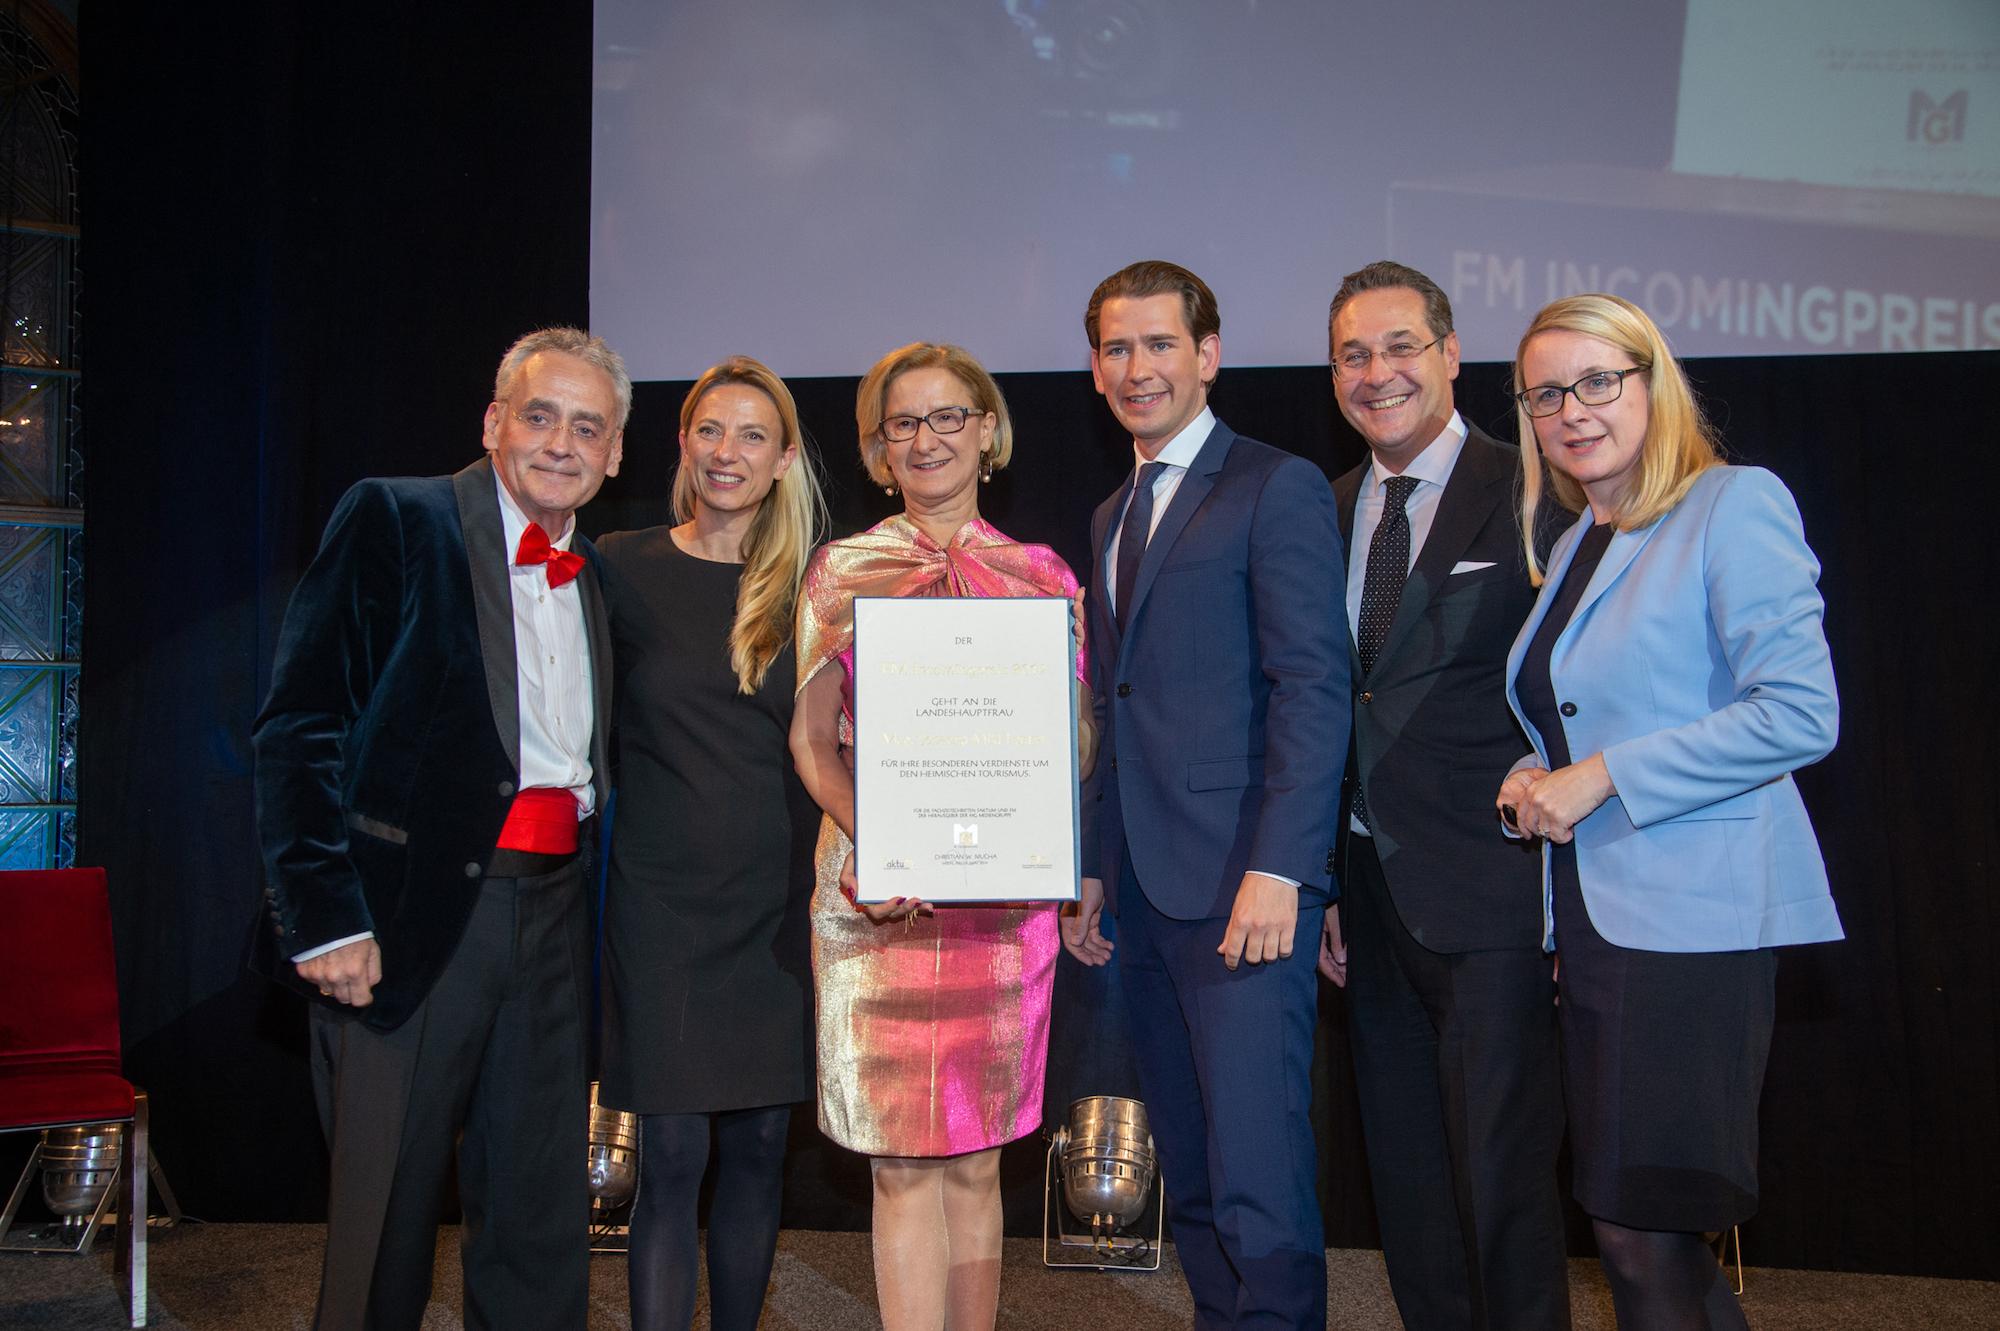 FM Incomingpreis im Wiener Palais Ferstel